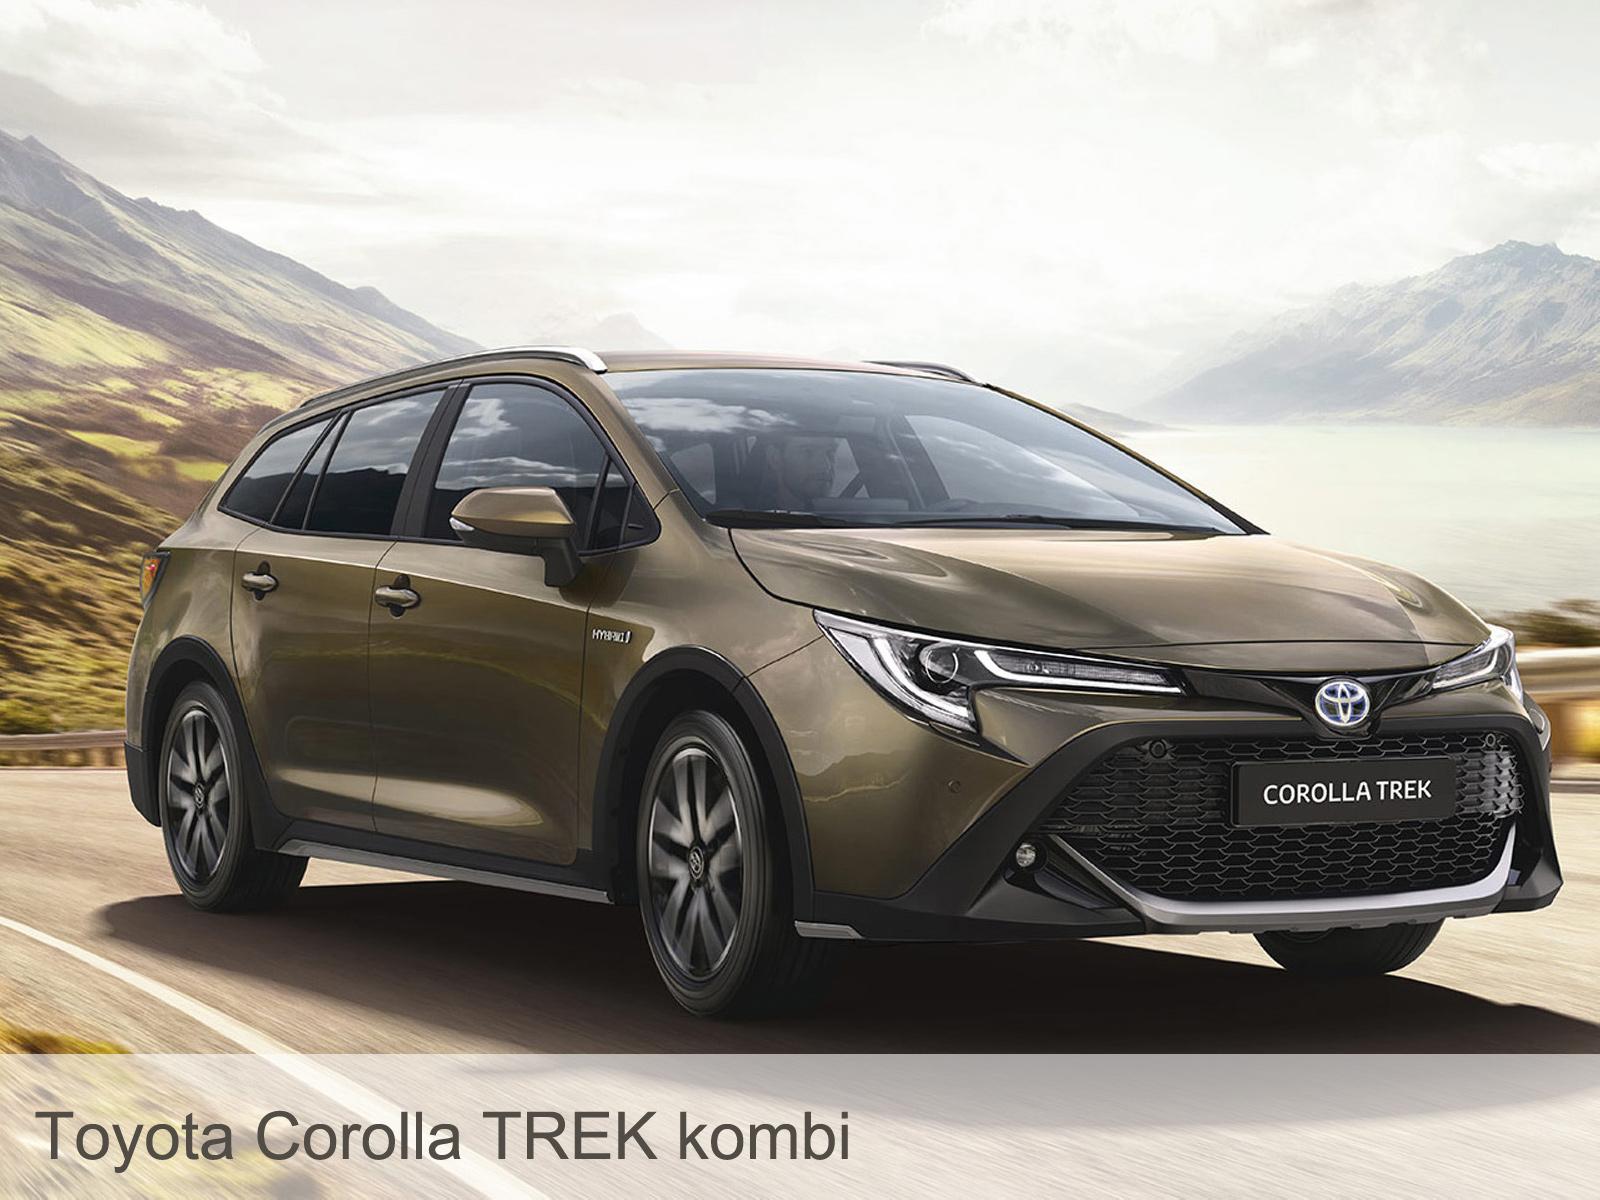 Toyota-Corolla-TREK-kombi